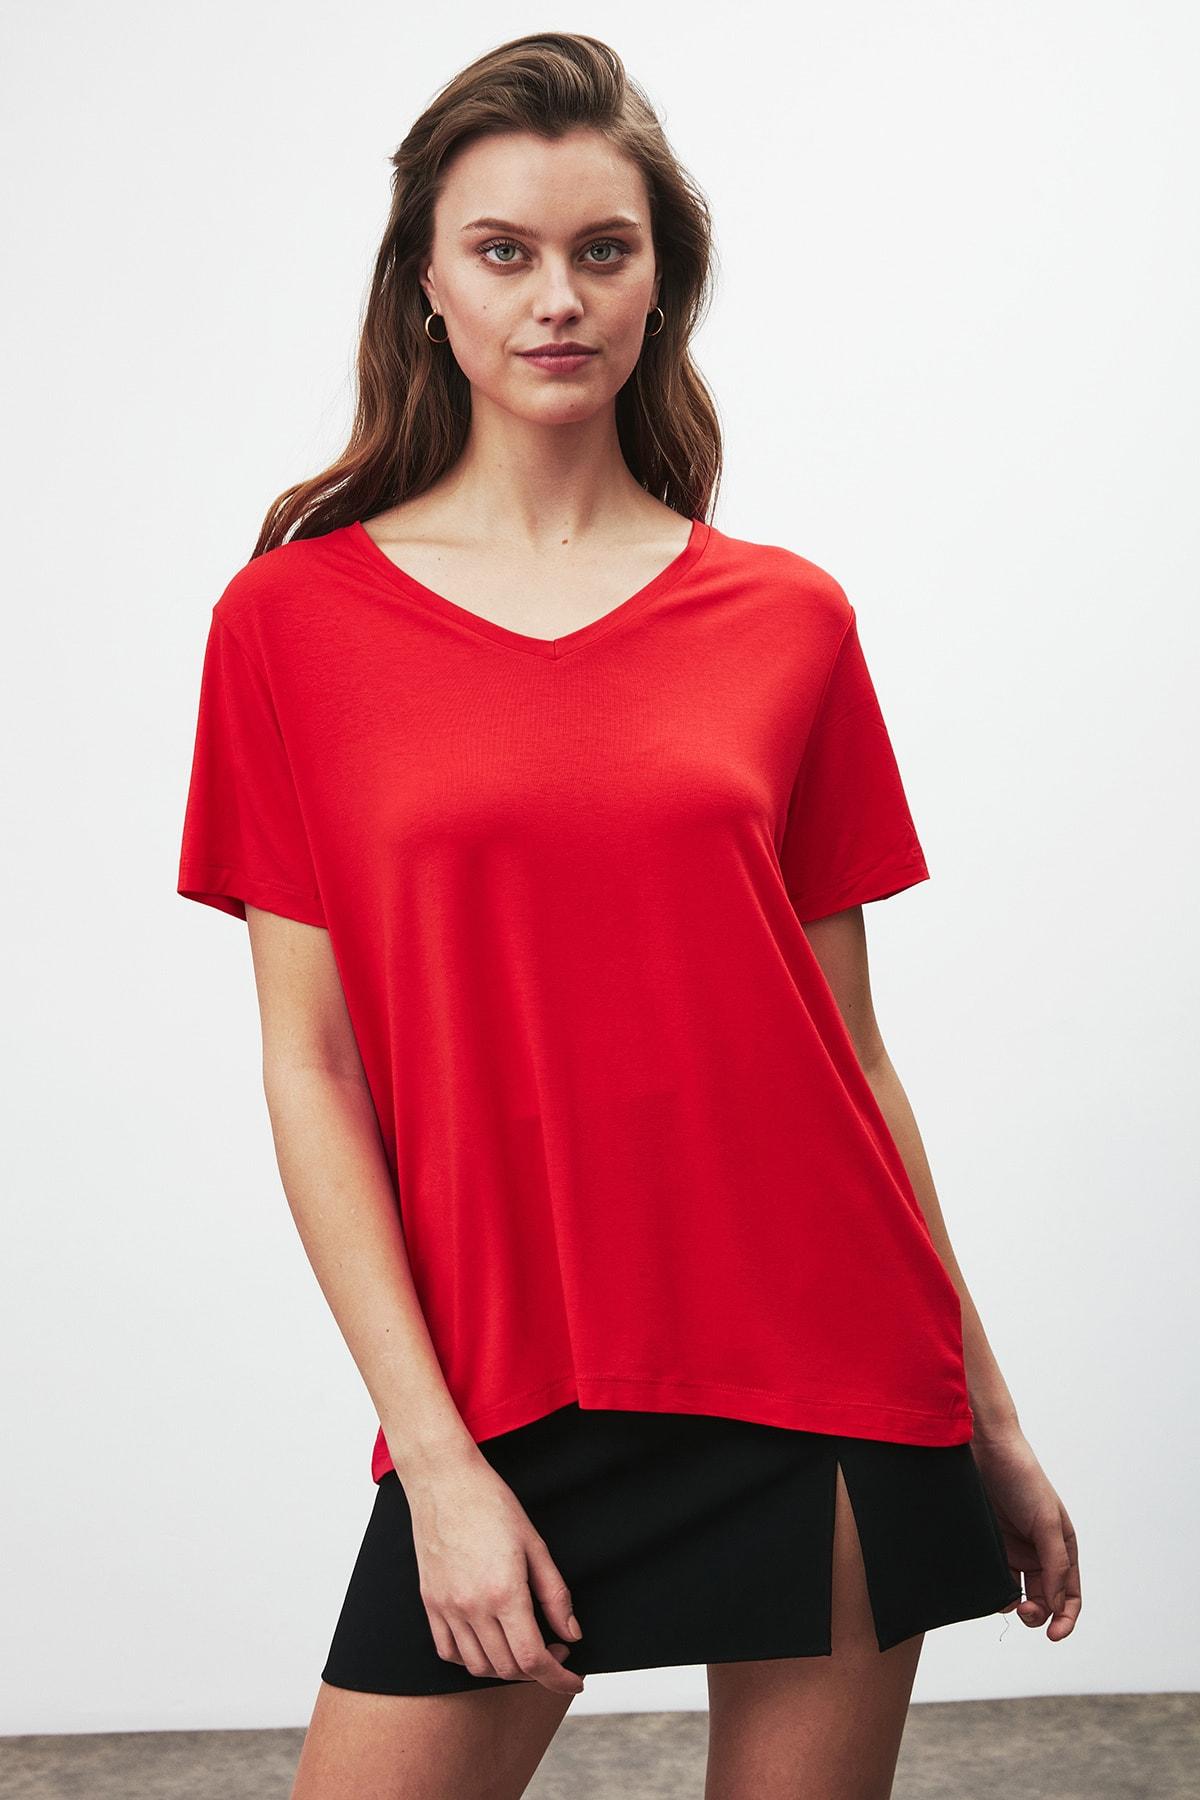 GRIMELANGE Vıolet Kadın Kırmızı Comfort Fit V Yaka Kısa Kollu T-shirt 0